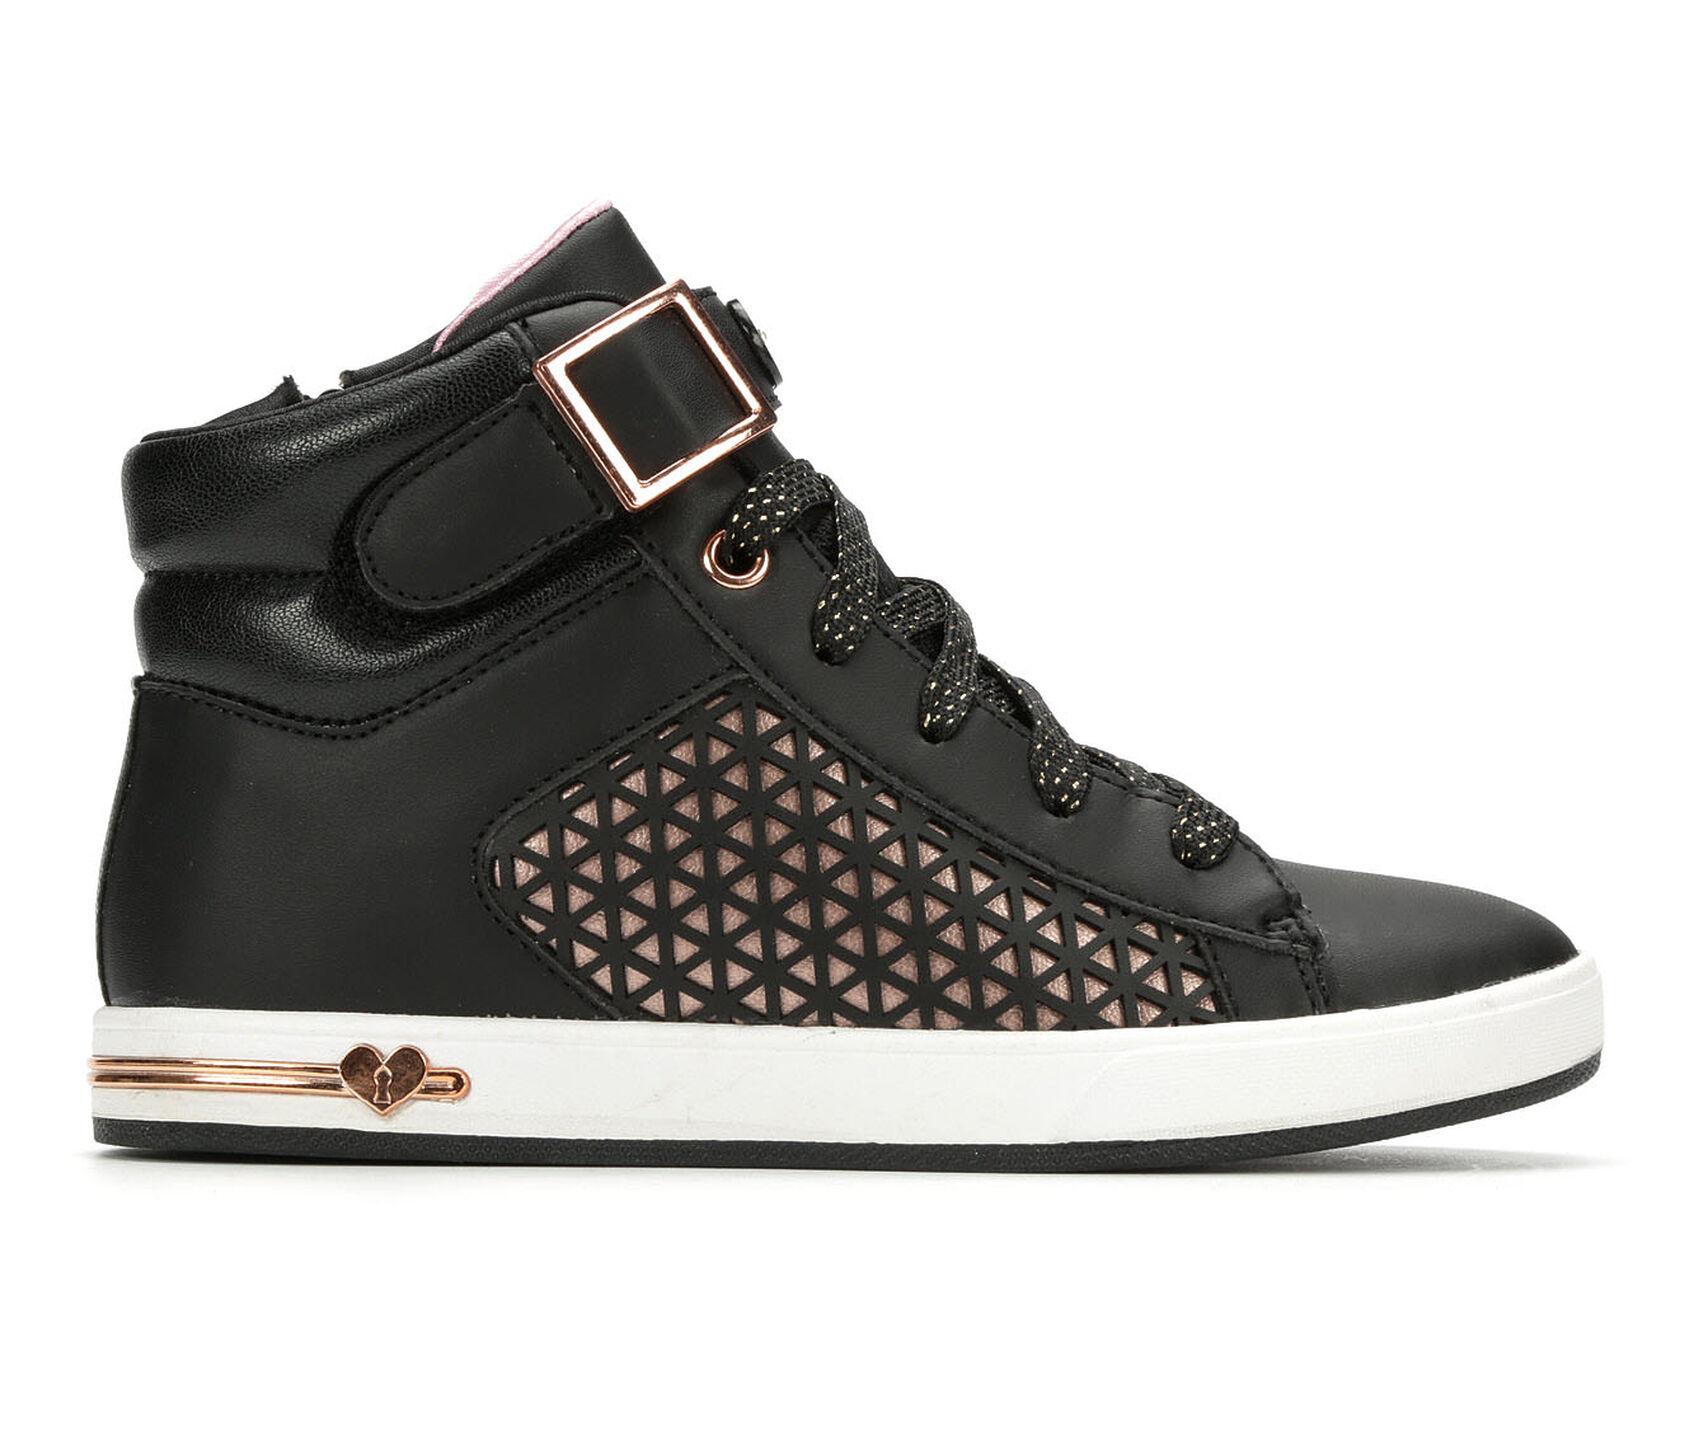 sale retailer e72f2 a1f34 Girls  Skechers Little Kid   Big Kid Edgy Glam Sneakers   Shoe Carnival